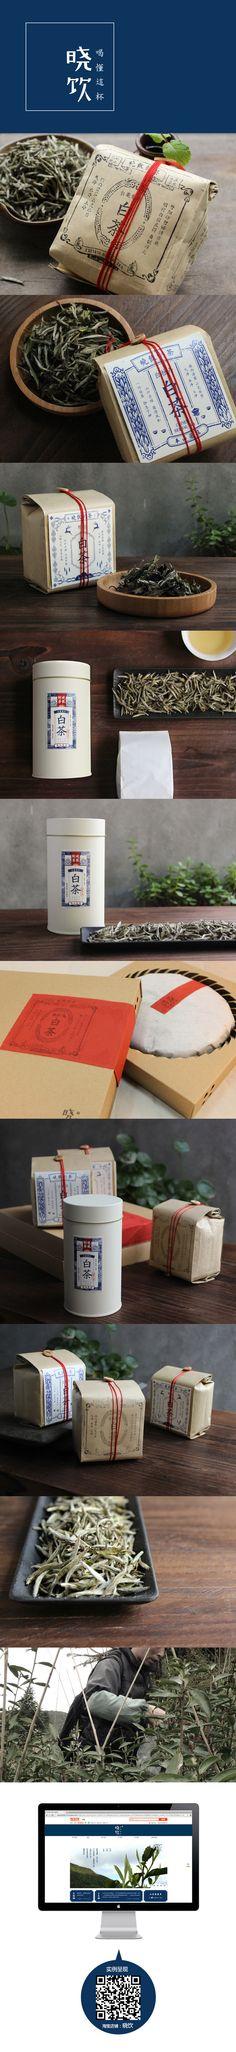 道威爾品牌設計|曉飲白茶的山野草木經 Japanese Packaging, Food Packaging Design, Coffee Packaging, Brand Packaging, Branding Design, Simple Packaging, Product Packaging, Tea Design, Food Design